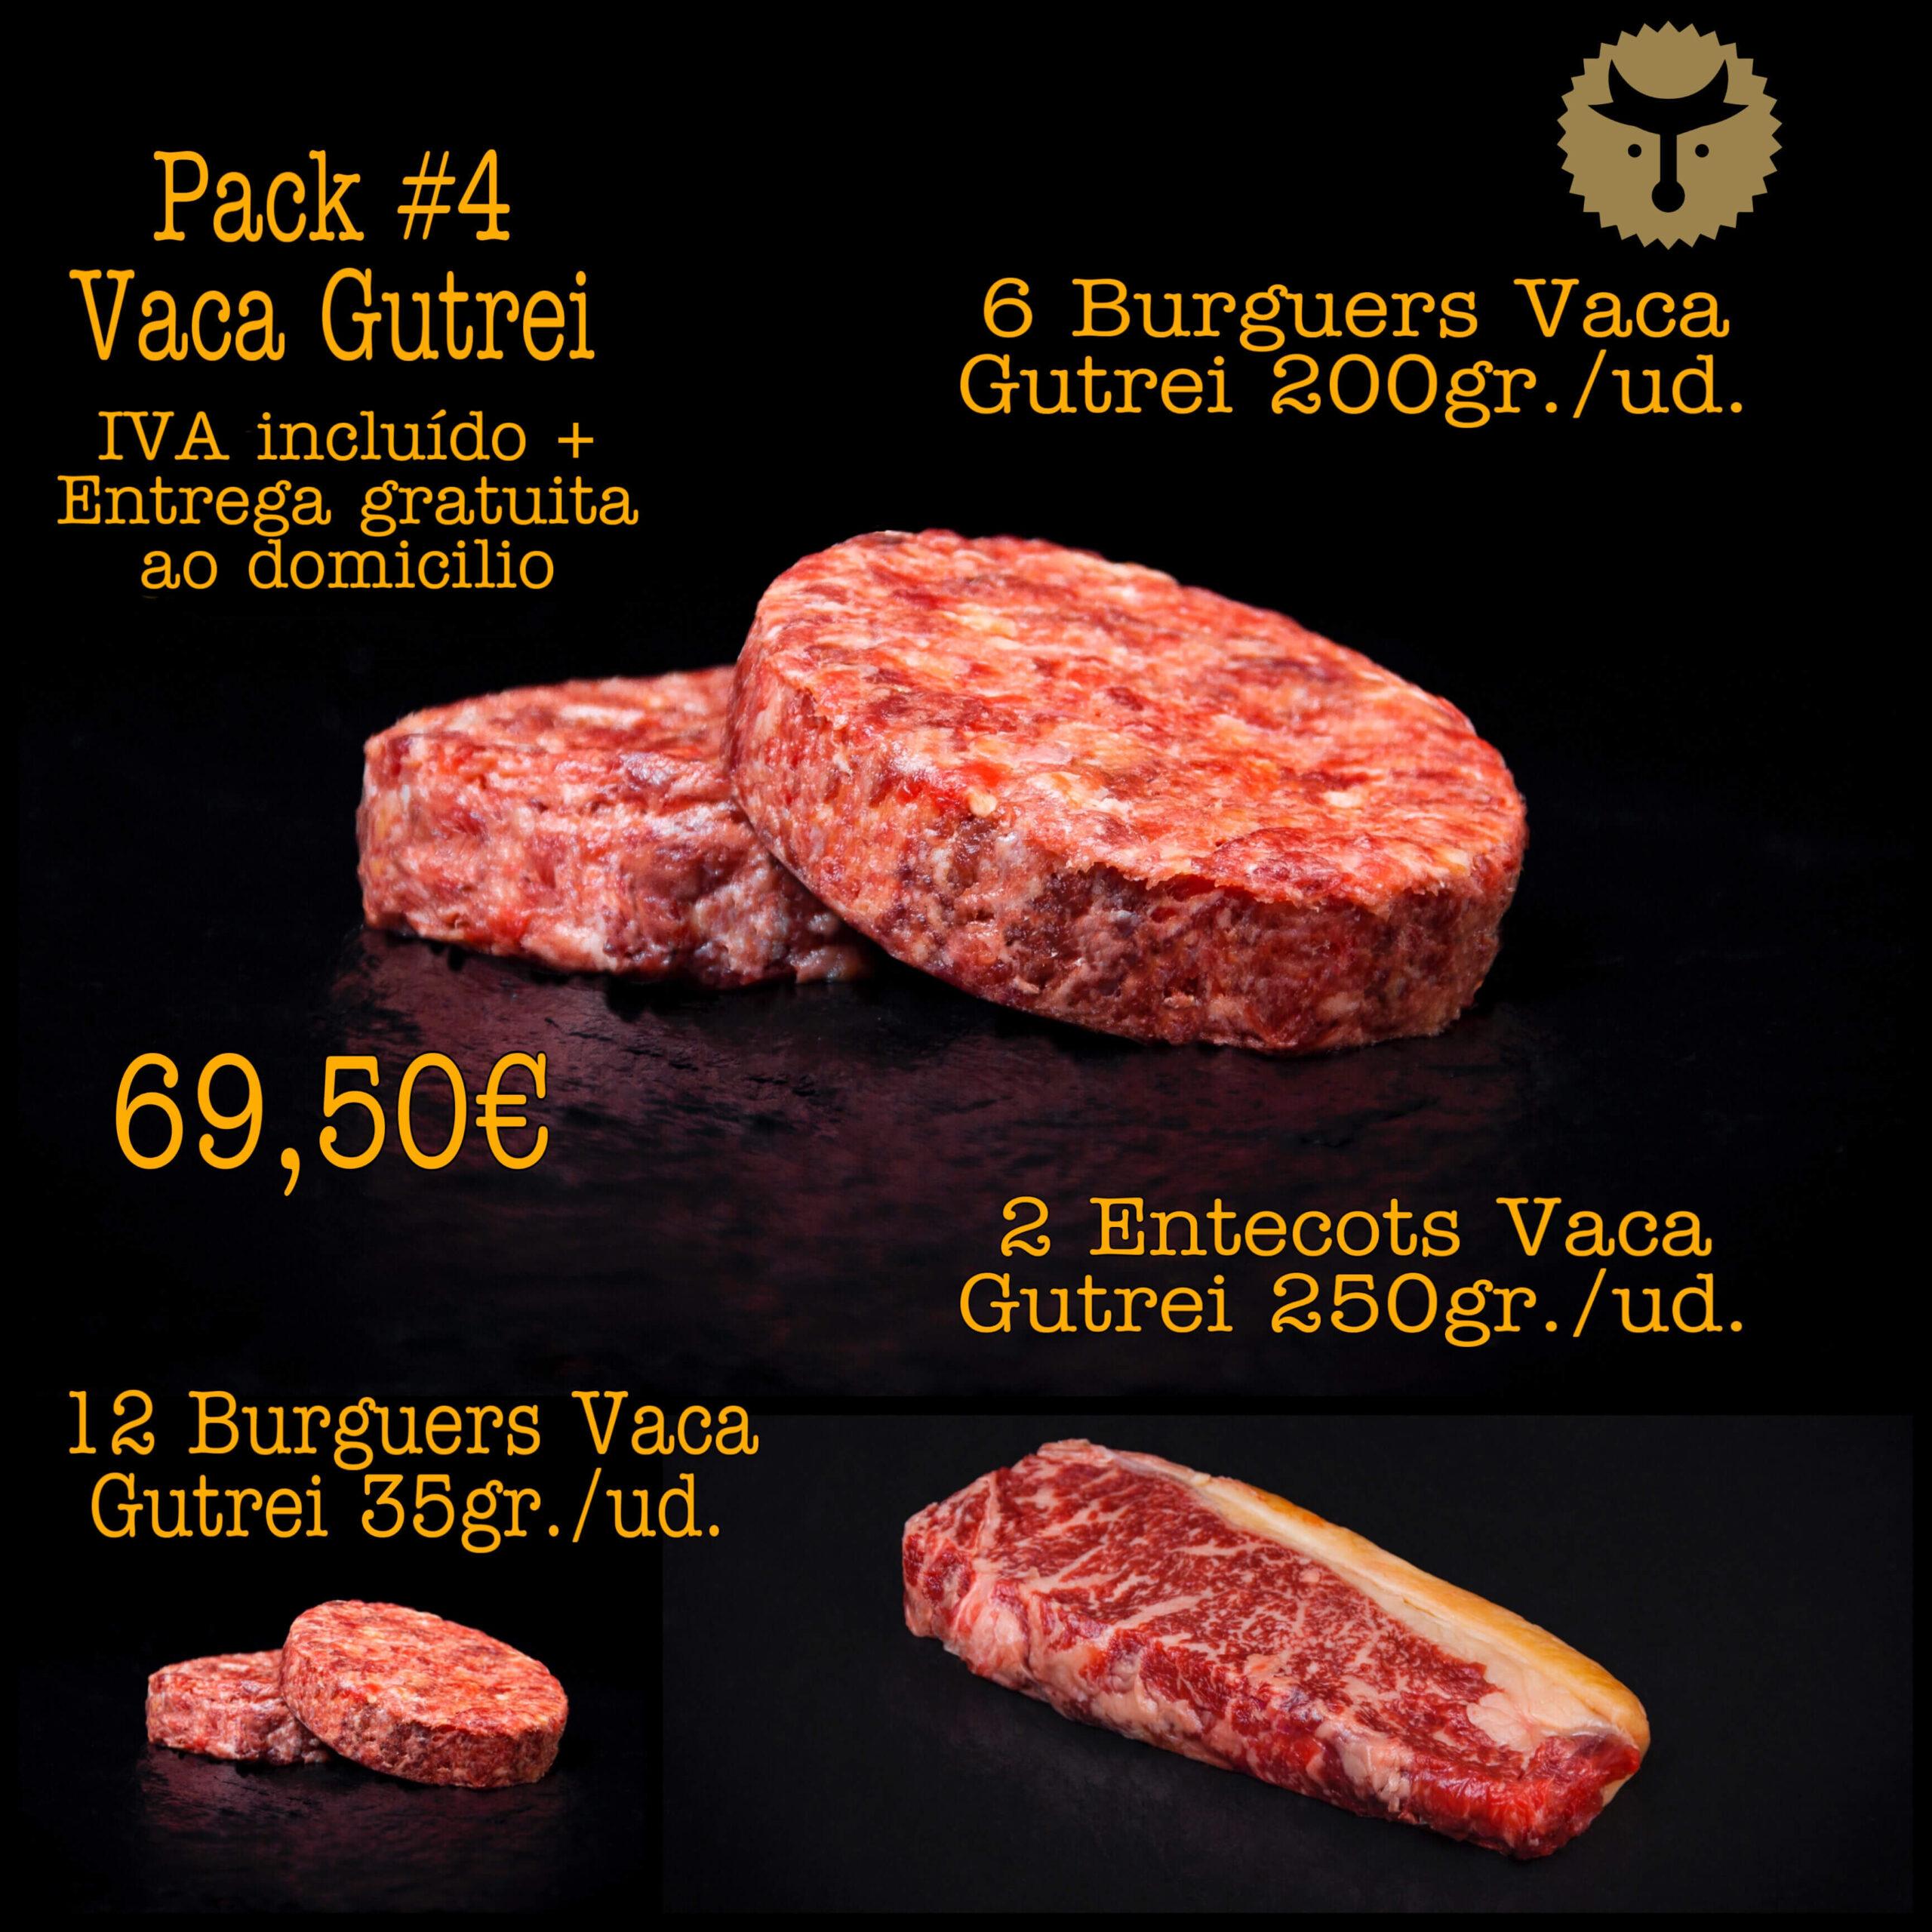 Pacote 4 Vaca Gutrei